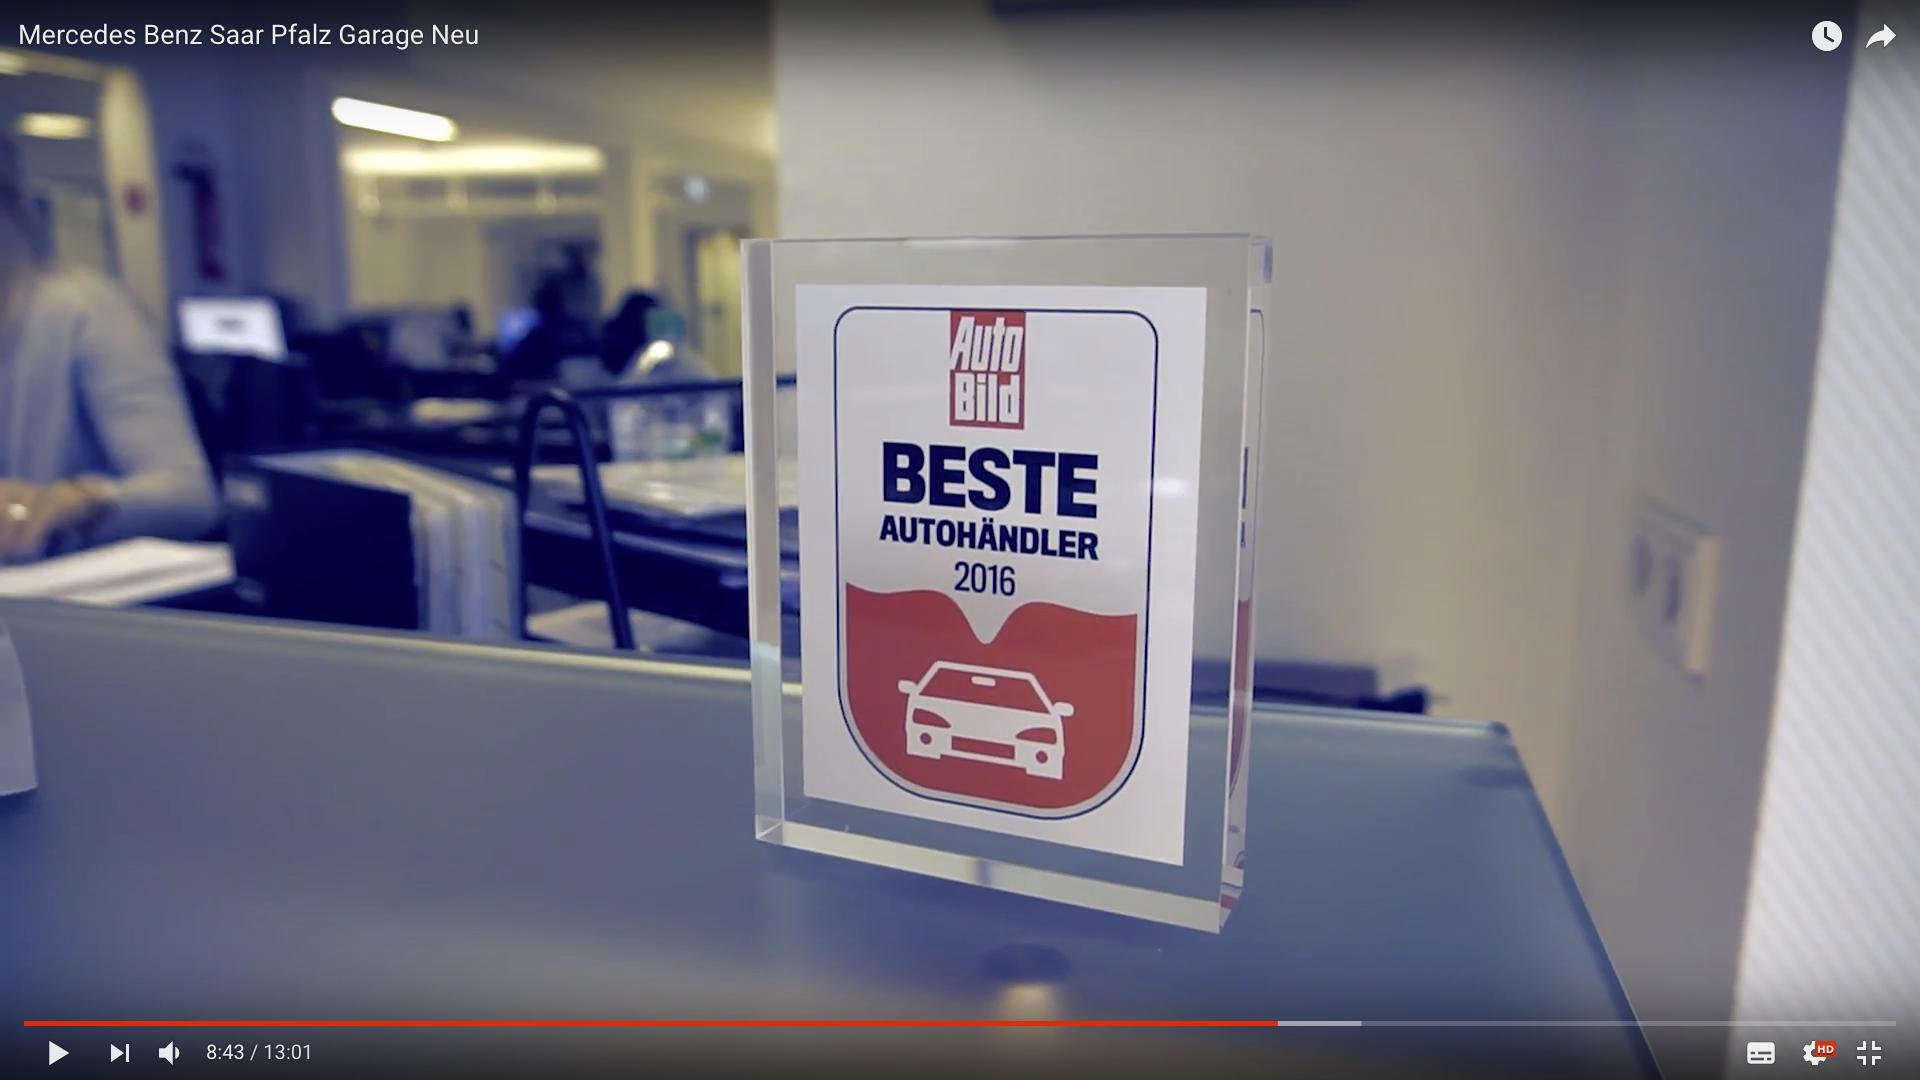 2017 Mercedes Benz Saar Pfalz Garage Neu Beste Autohändler 2016_MSM_MEDIEN_SAAR_MOSEL_SAARLAND_FERNSEHEN_1_ED_SAAR